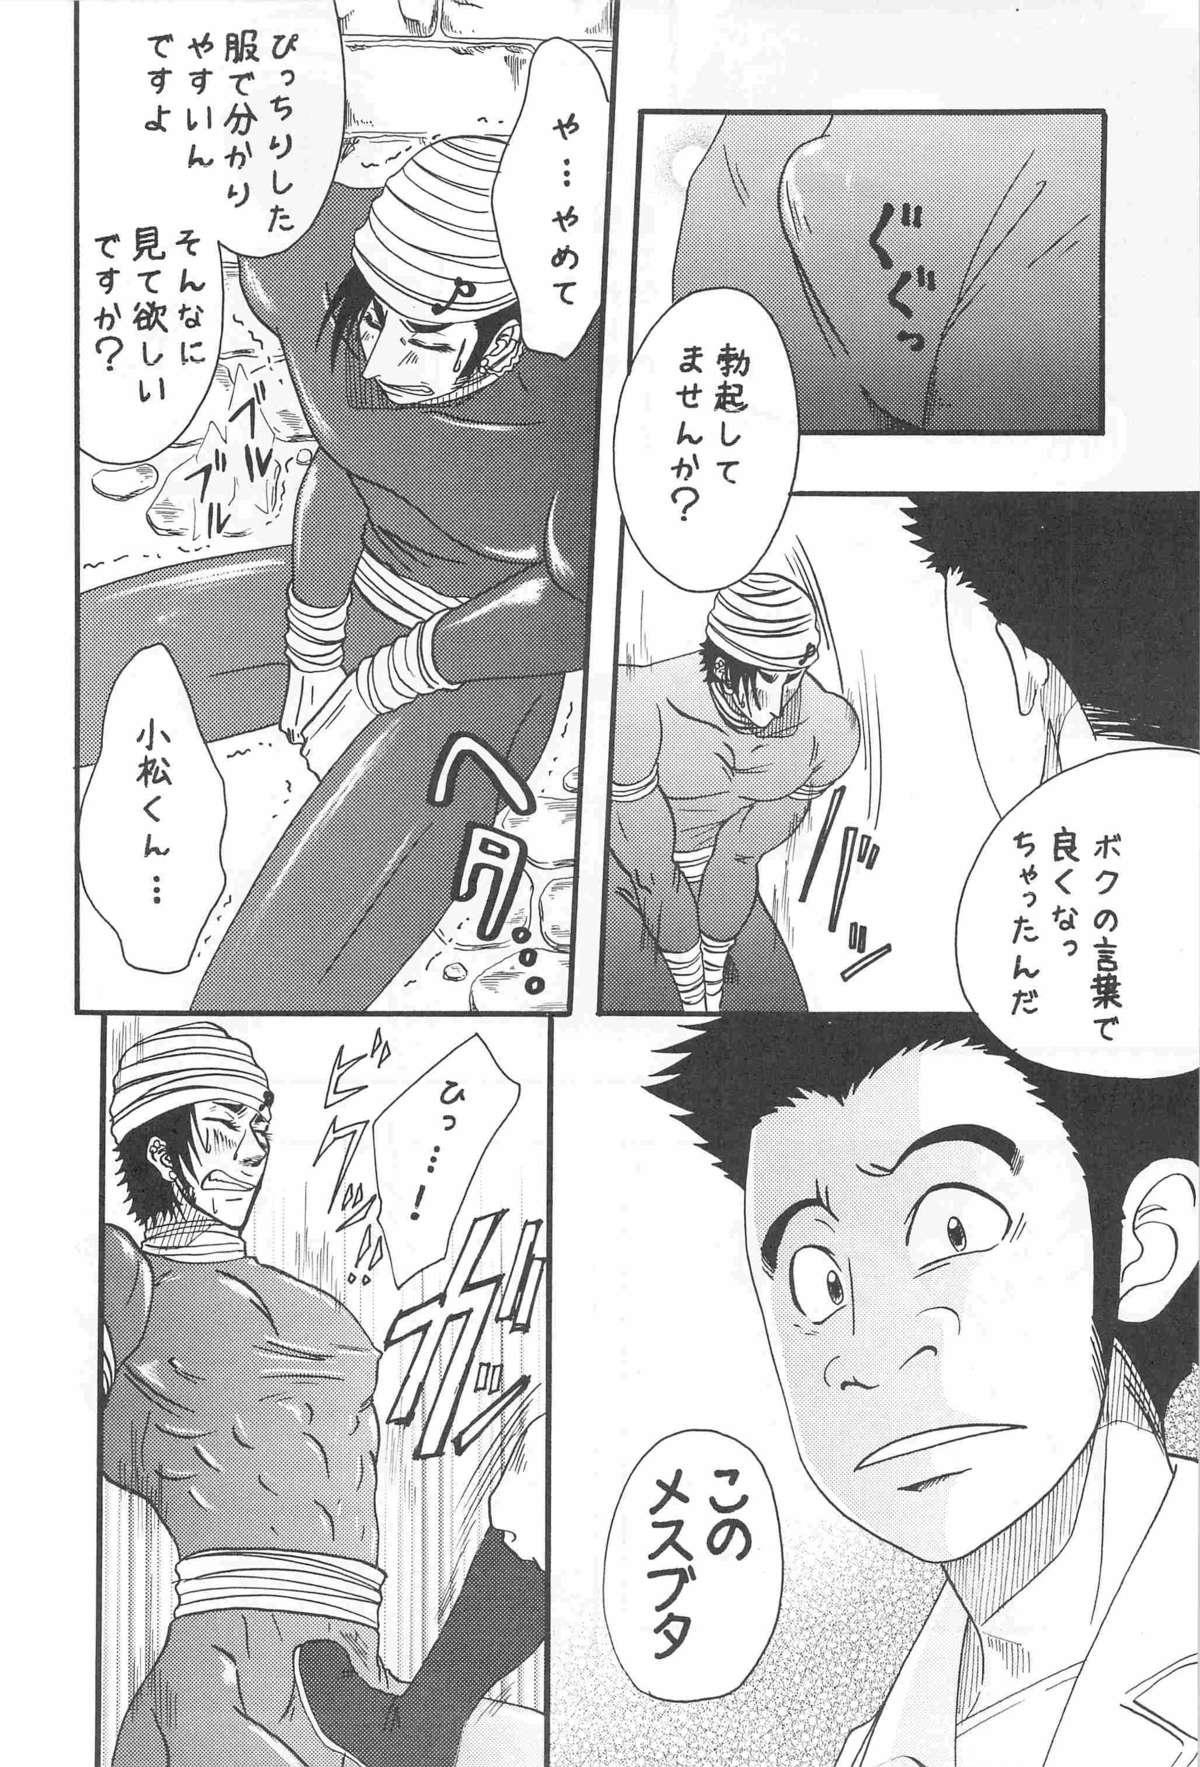 [Kijima Hyougo,Jun'ai Meringue-don,RIN!] [msbt] (Toriko) 19